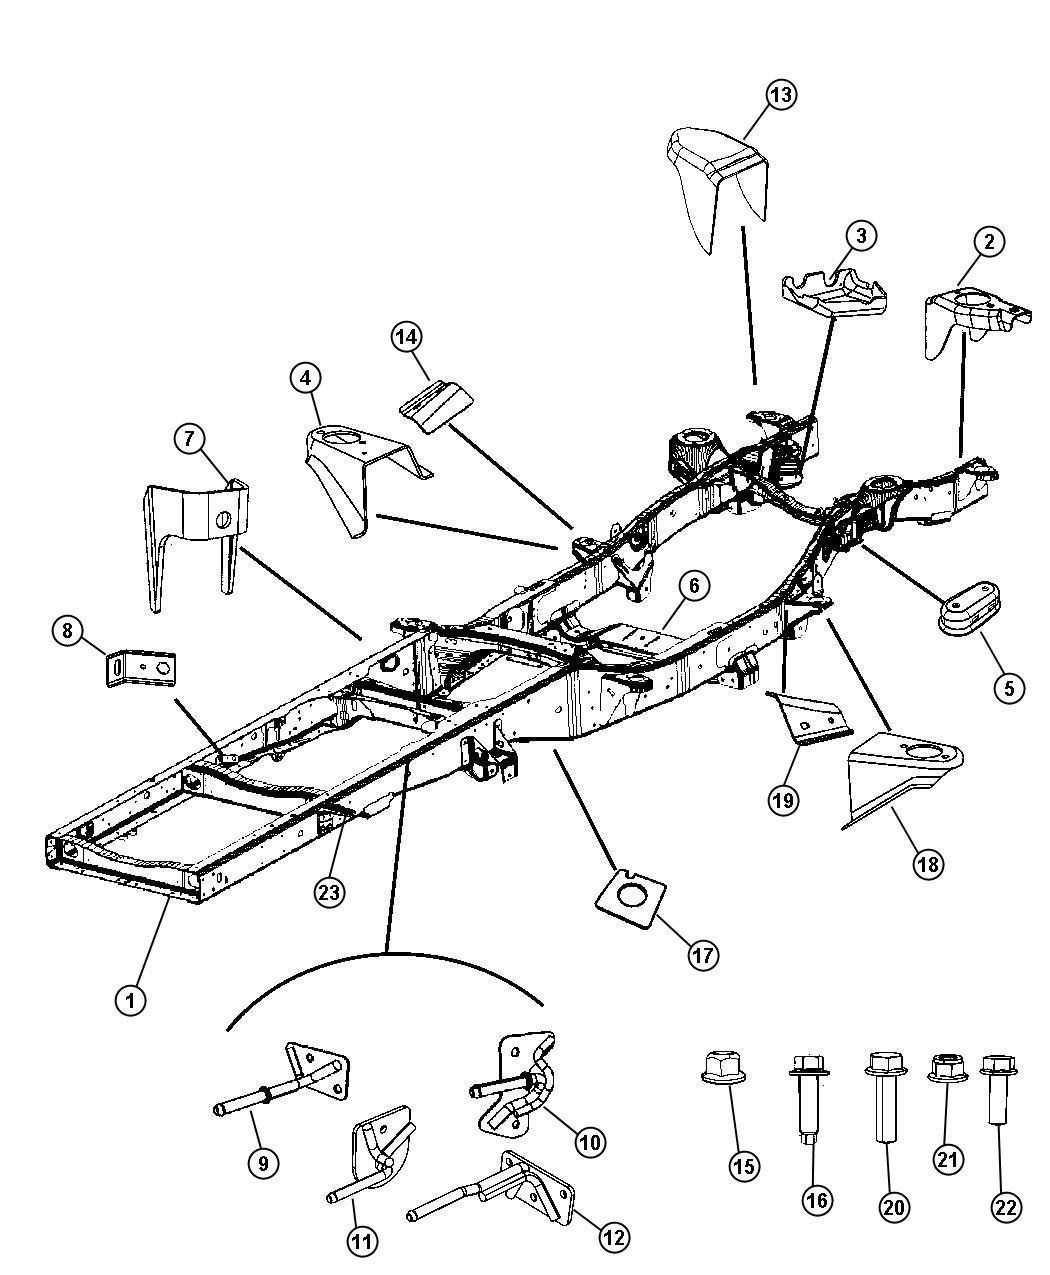 tags: #ktm wiring diagrams#motorcycle cdi diagram#tao tao wiring diagram#motion  detector light wiring diagram#tomos parts catalog#150cc scooter wiring